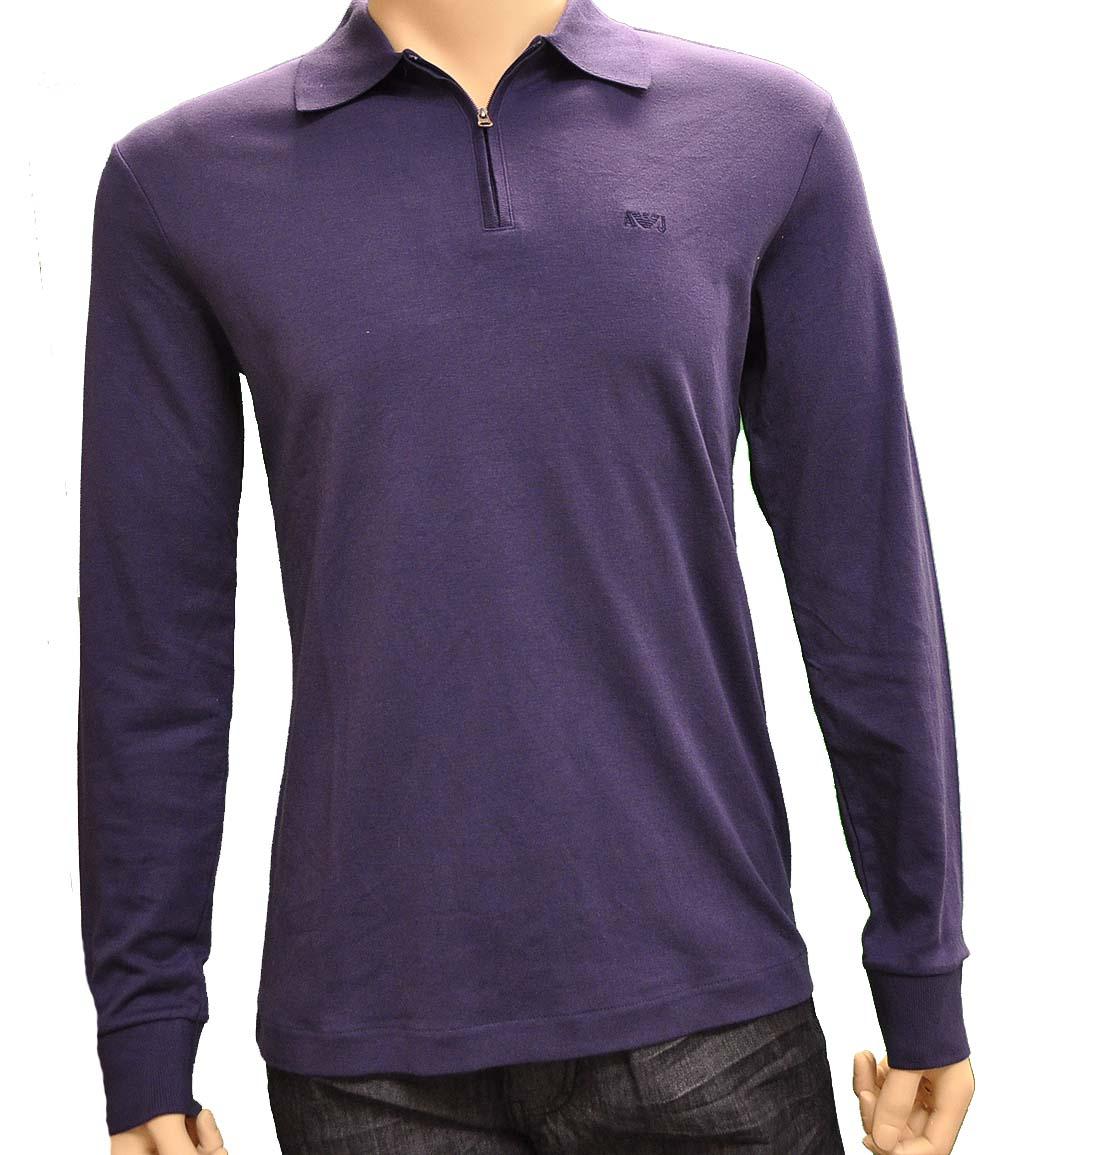 Armani Jeans Purple Cotton Shirt